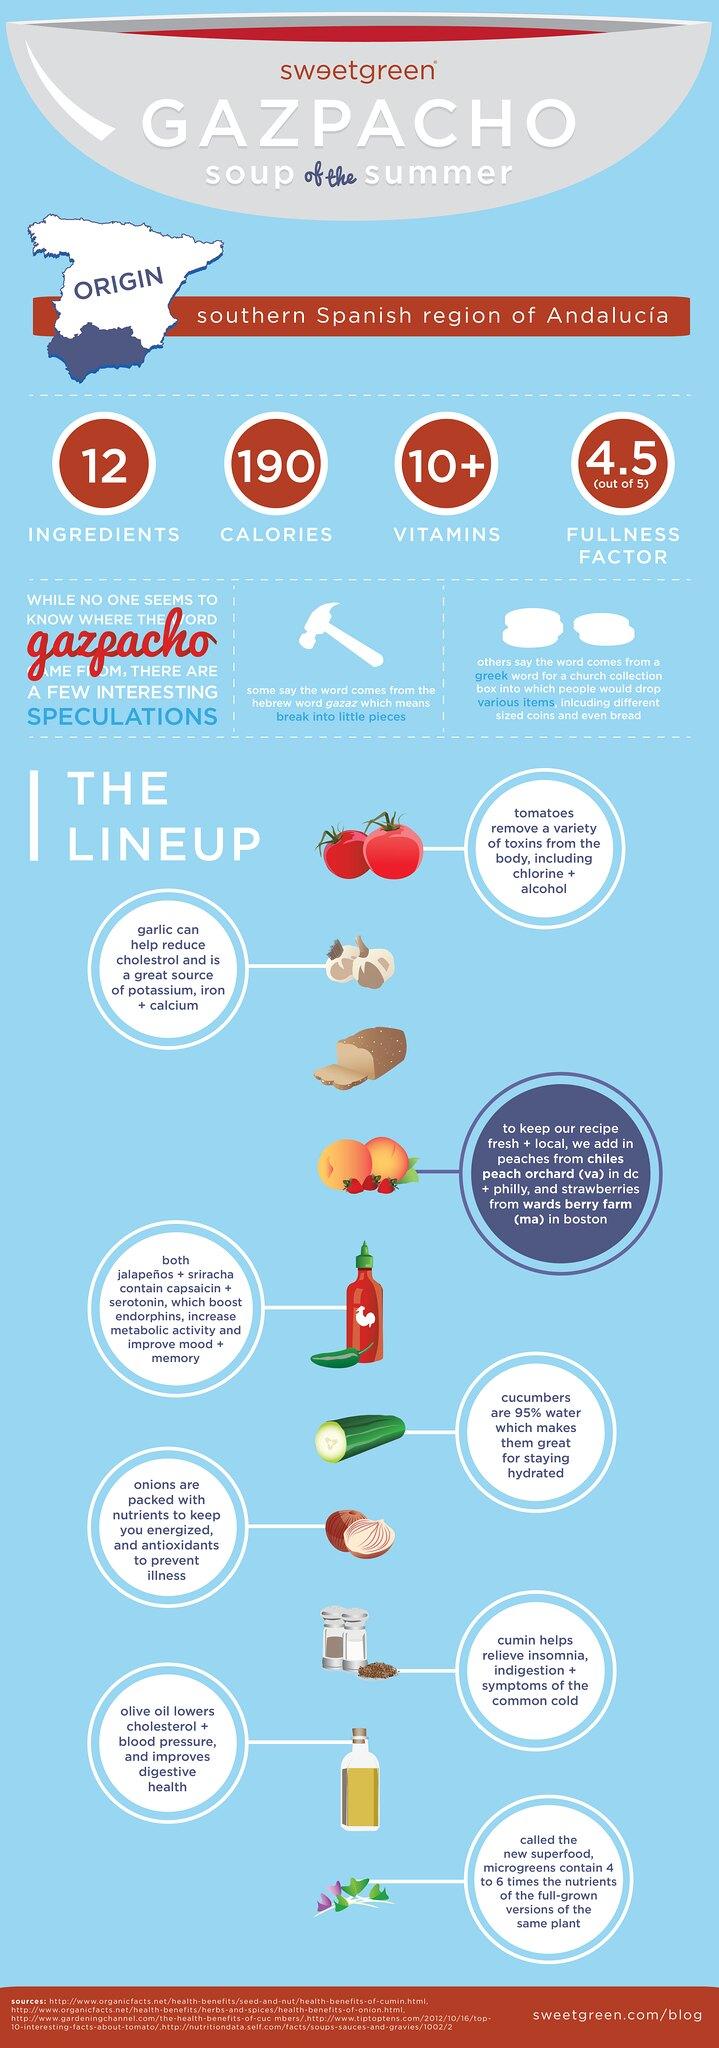 sweetgreen Gazpacho infographic